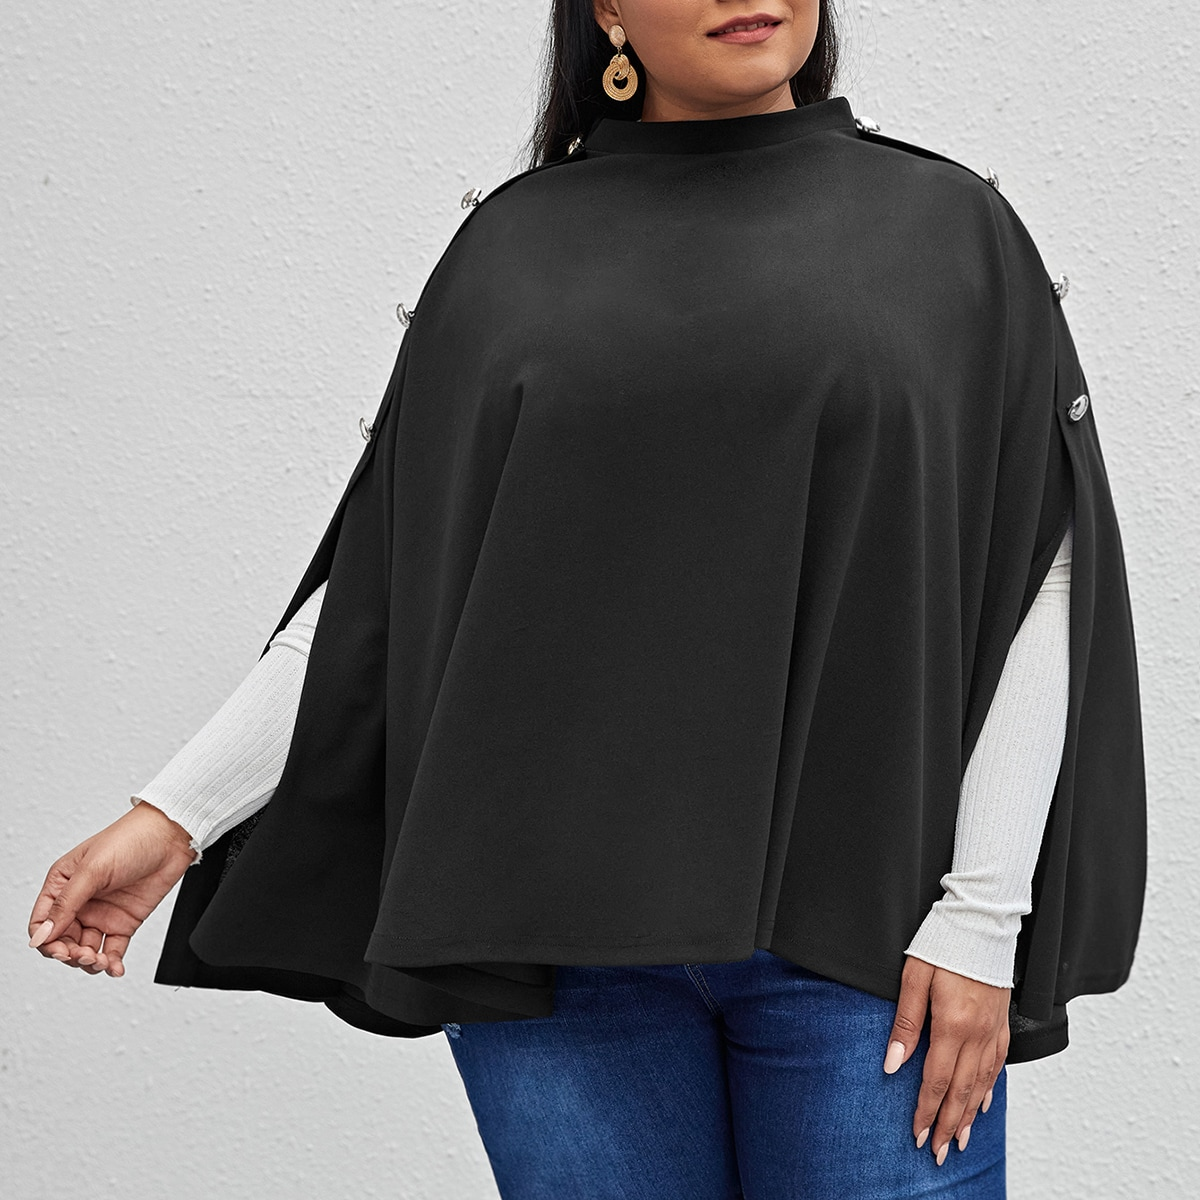 на пуговицах Одноцветный Элегантный Плюс размеры пальто